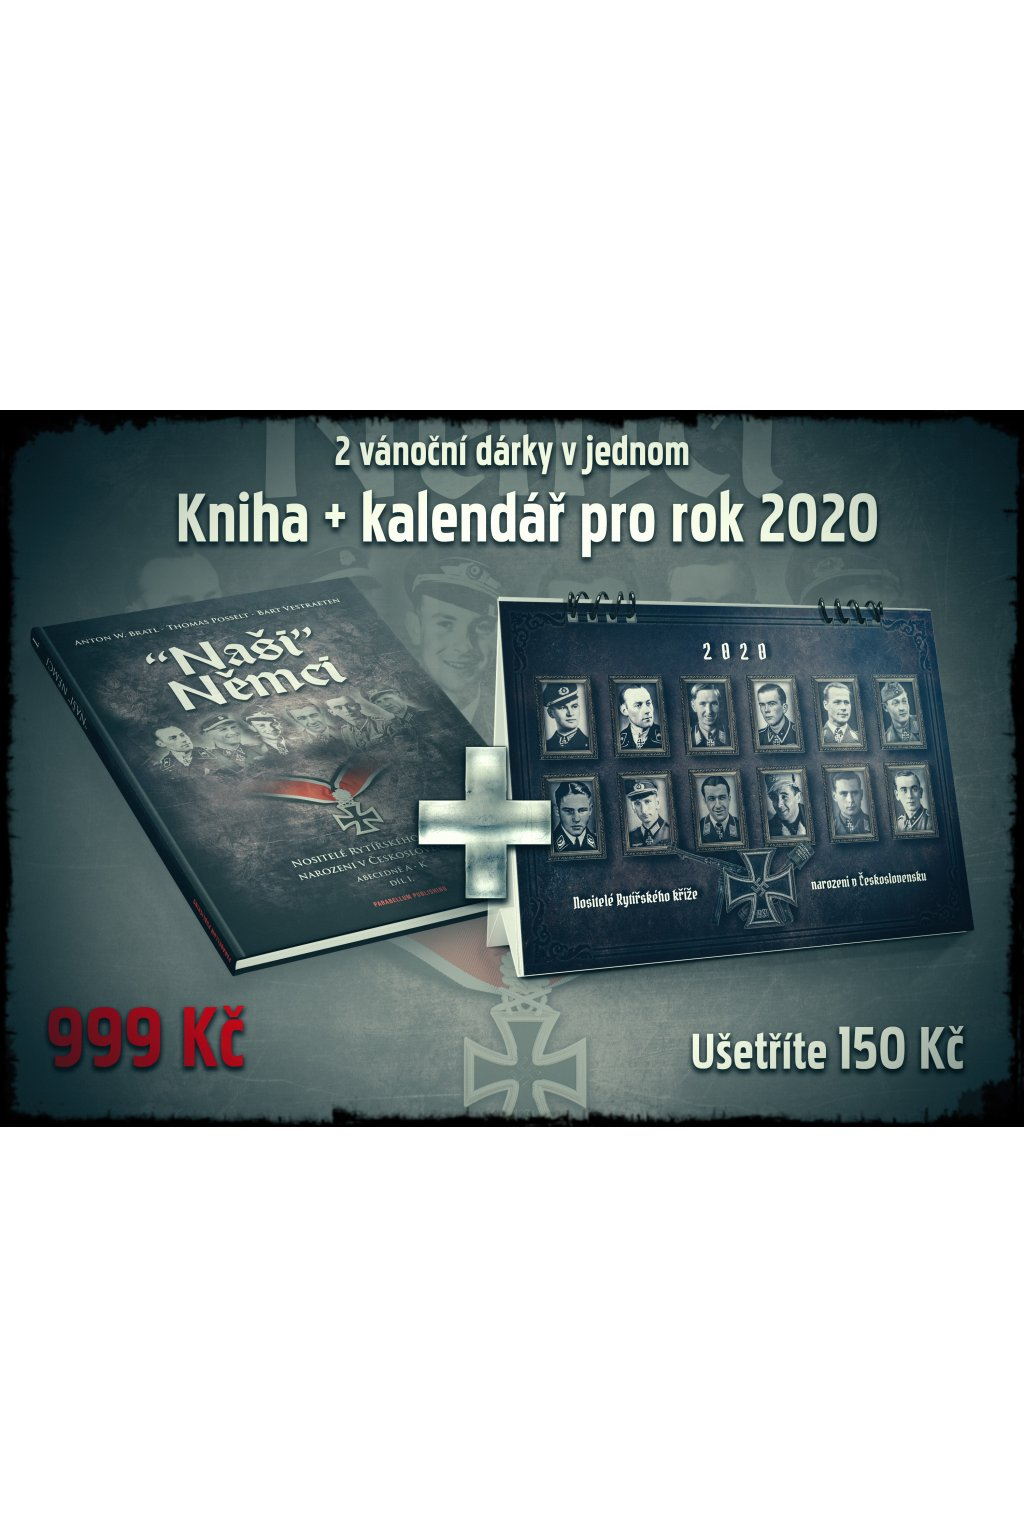 Kniha nasi nemci reklama[2452]